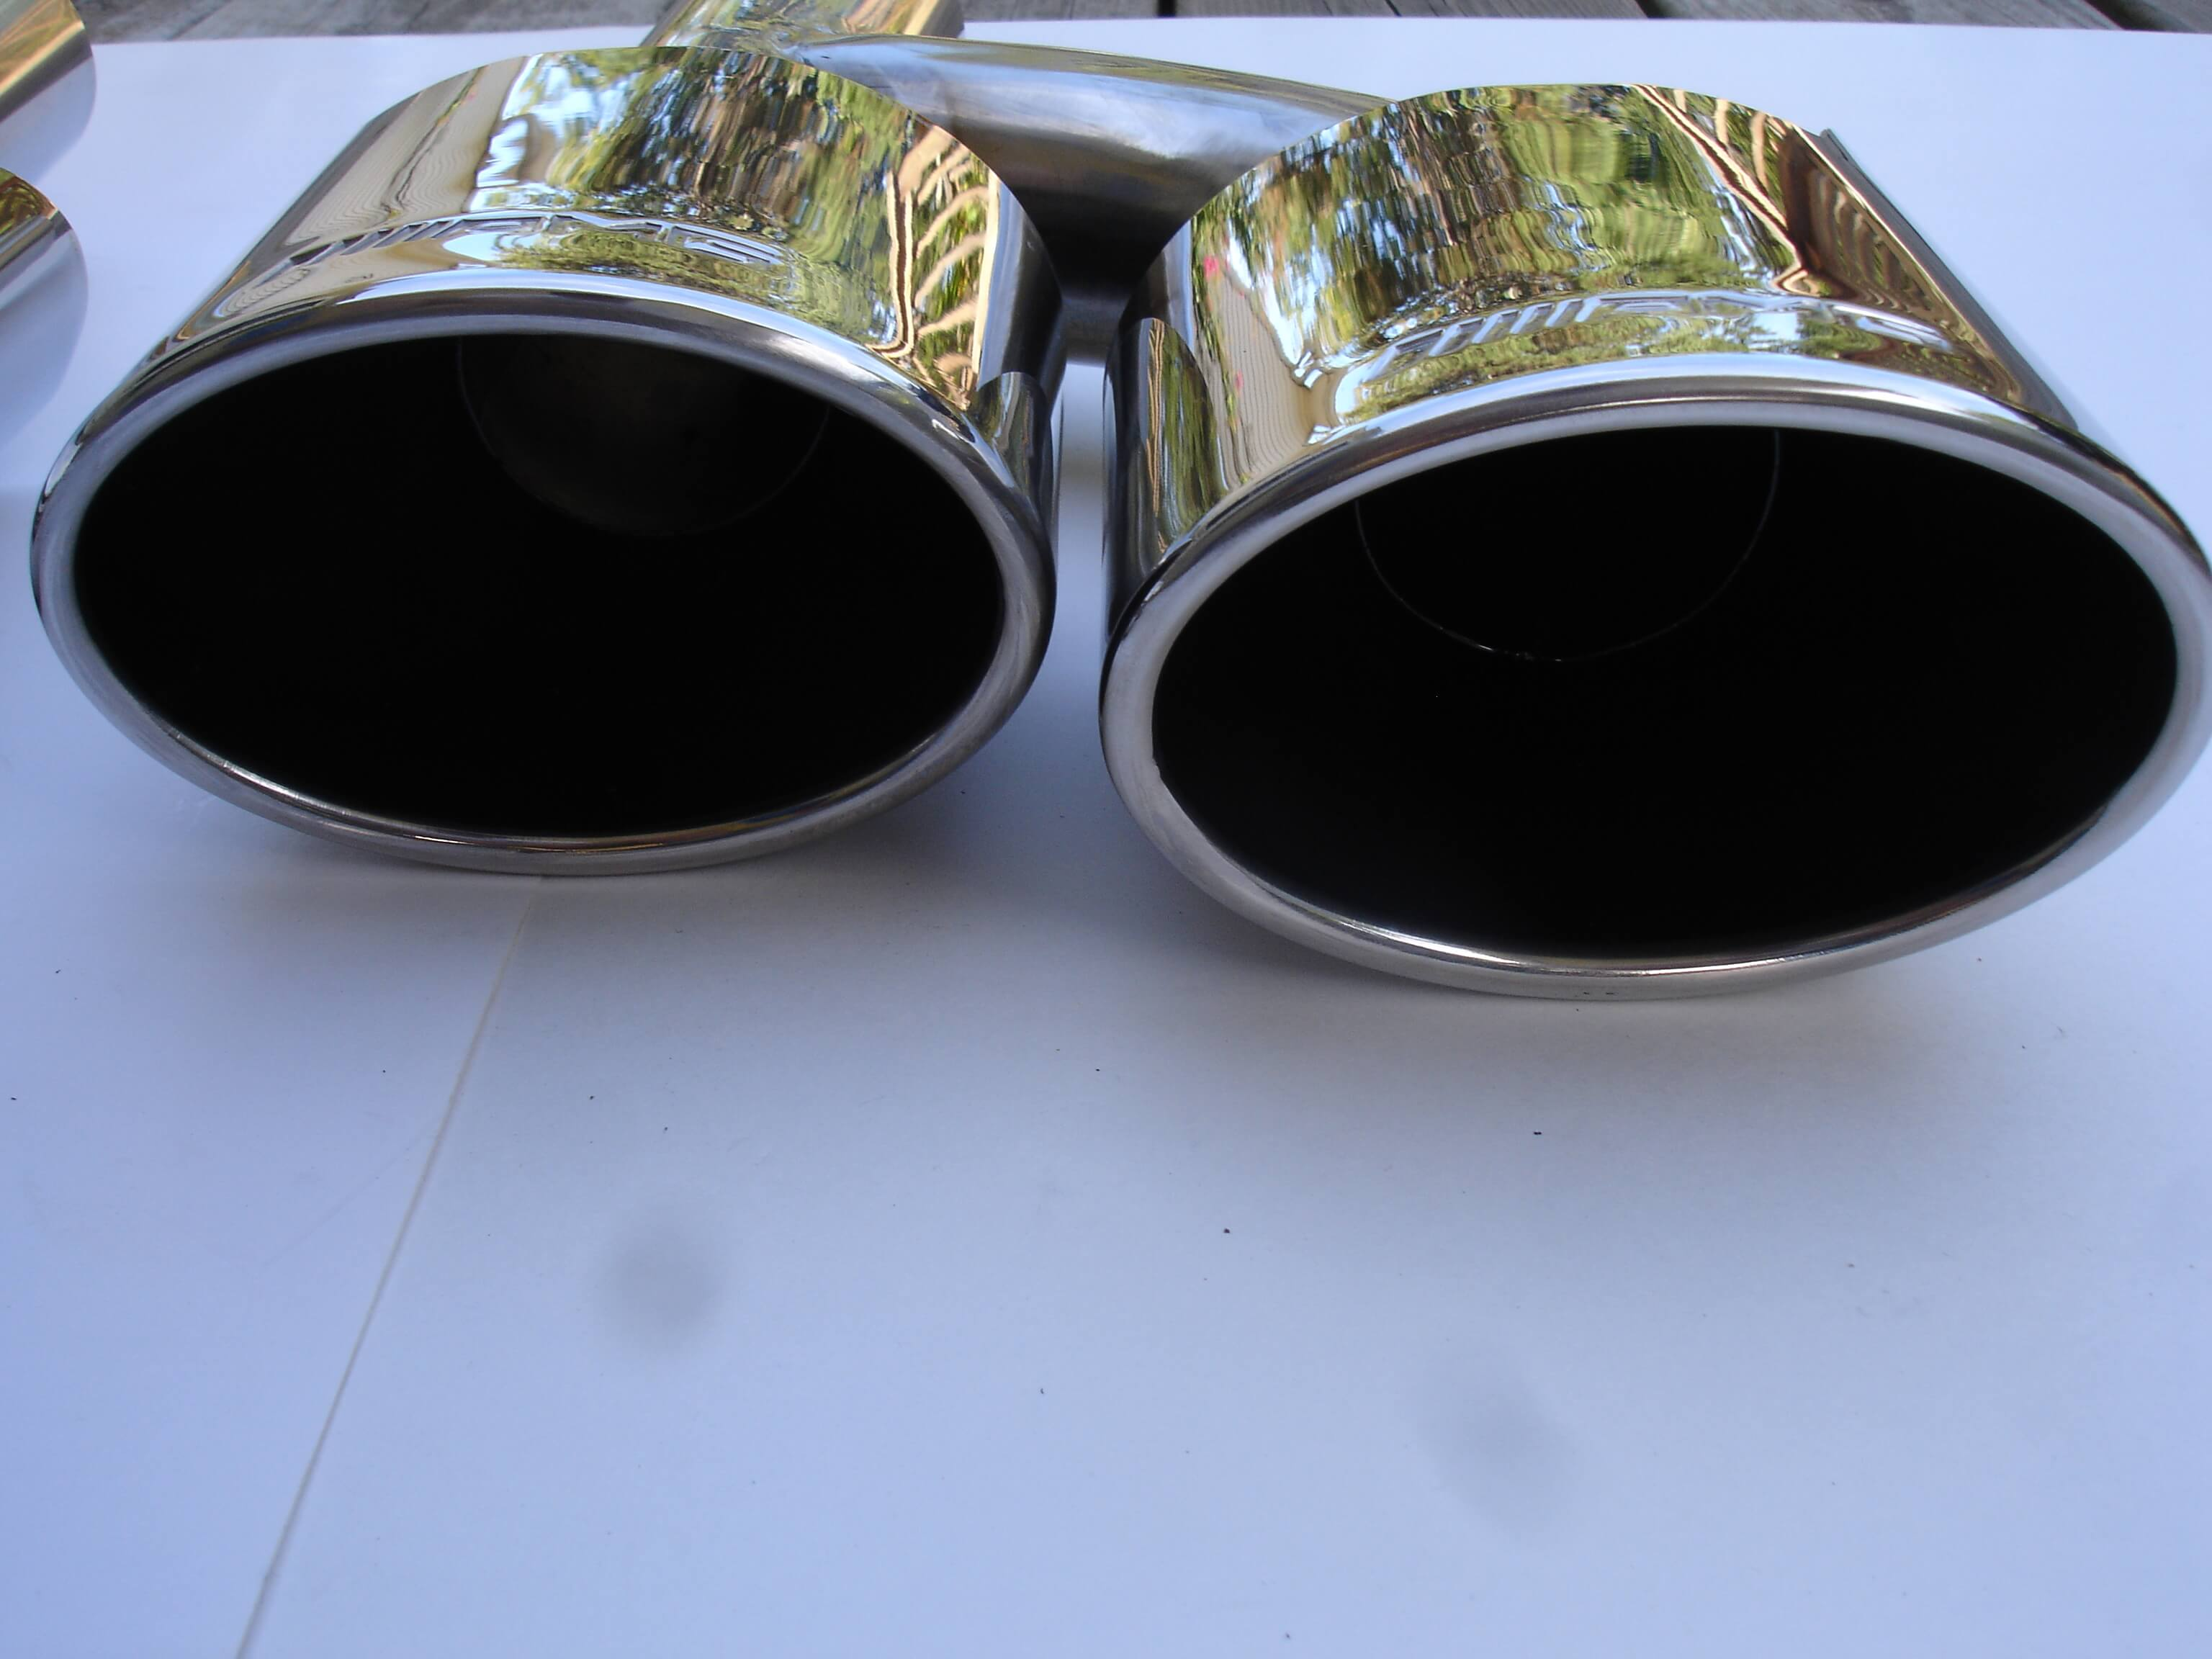 Mercedes Benz C63 AMG Style Exhaust Tips W204 C Class C63 C300 C350 08-12